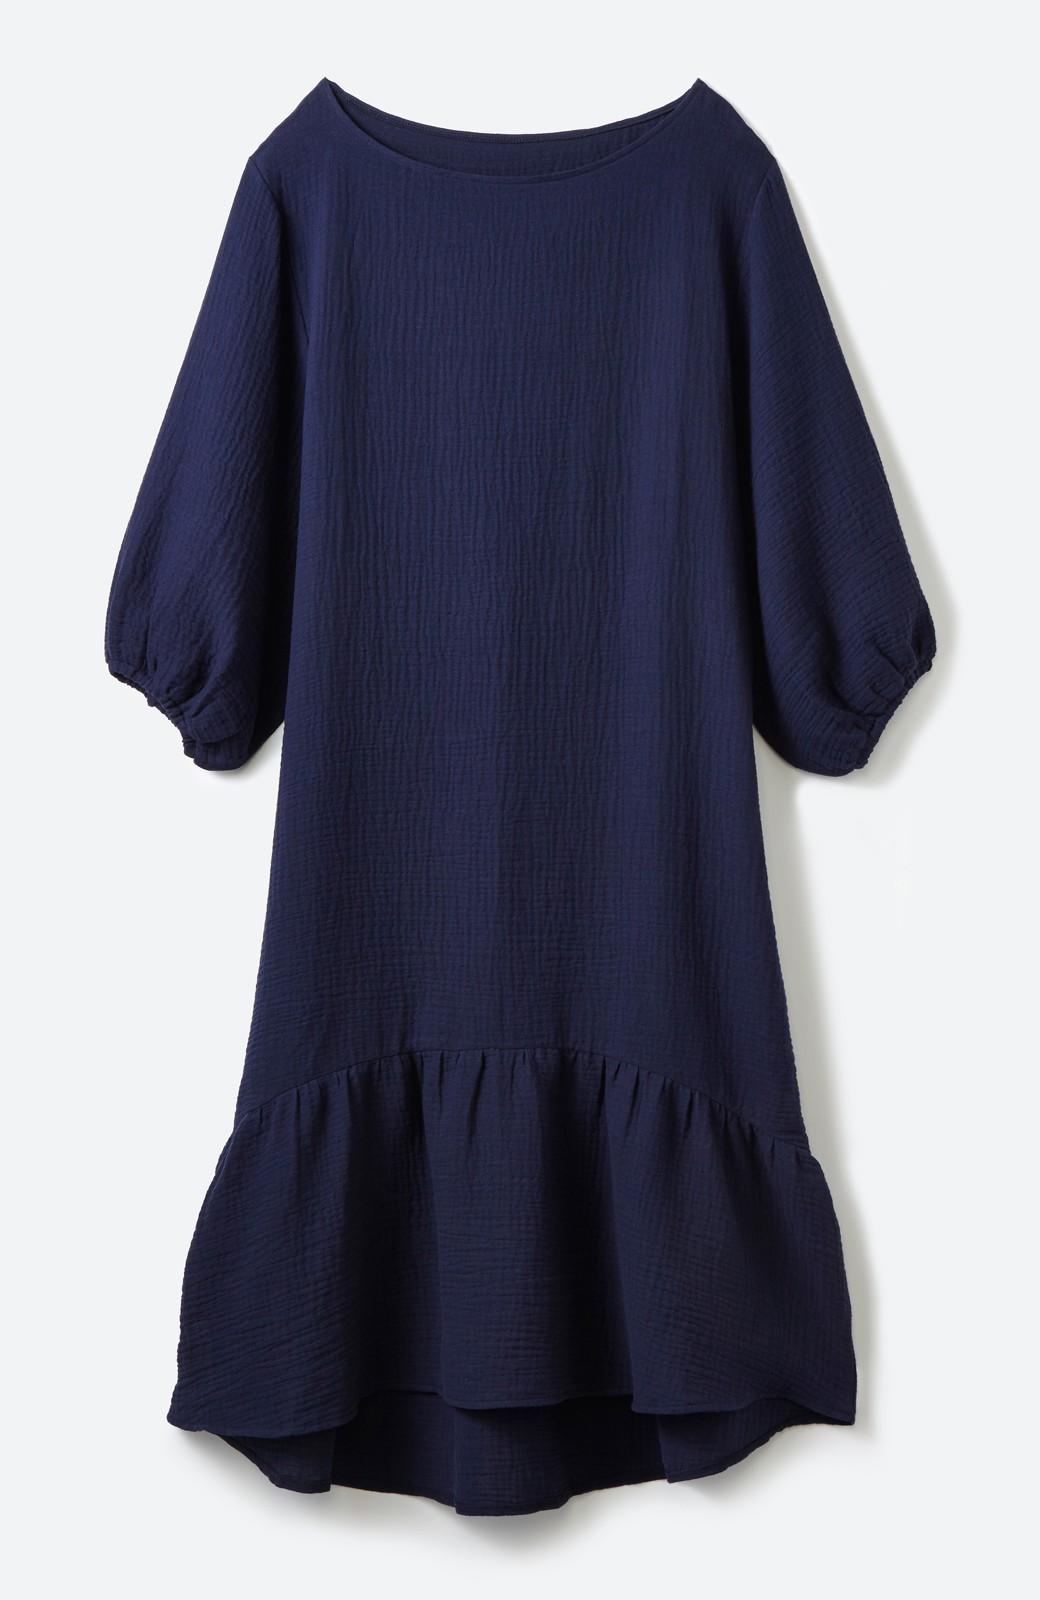 nusy すぽっと着られて着心地さわやか ぽんわり袖ガーゼワンピース <ネイビー>の商品写真2